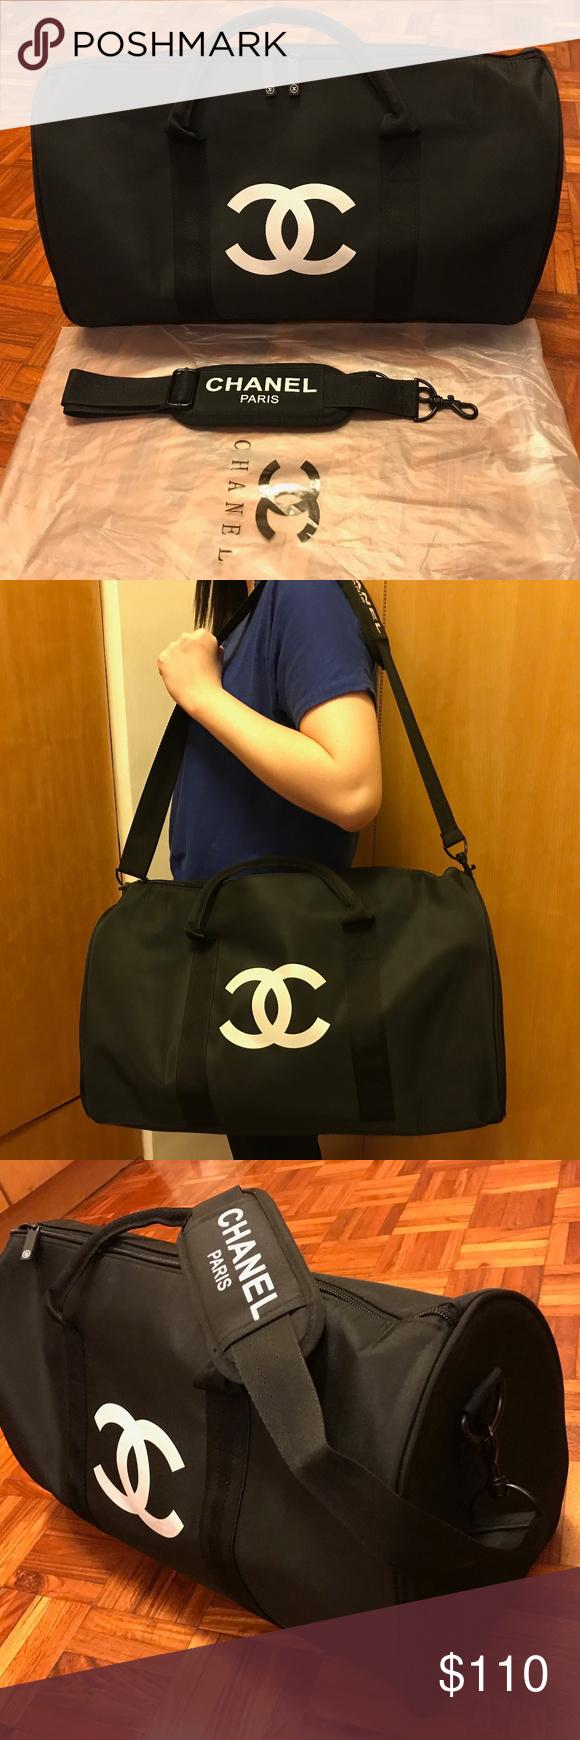 cf7b2182cc46 Chanel VIP Gift Bag Travel Bag Gym Duffel Weekend Authentic Chanel VIP  Travel Duffel Bag Weekend